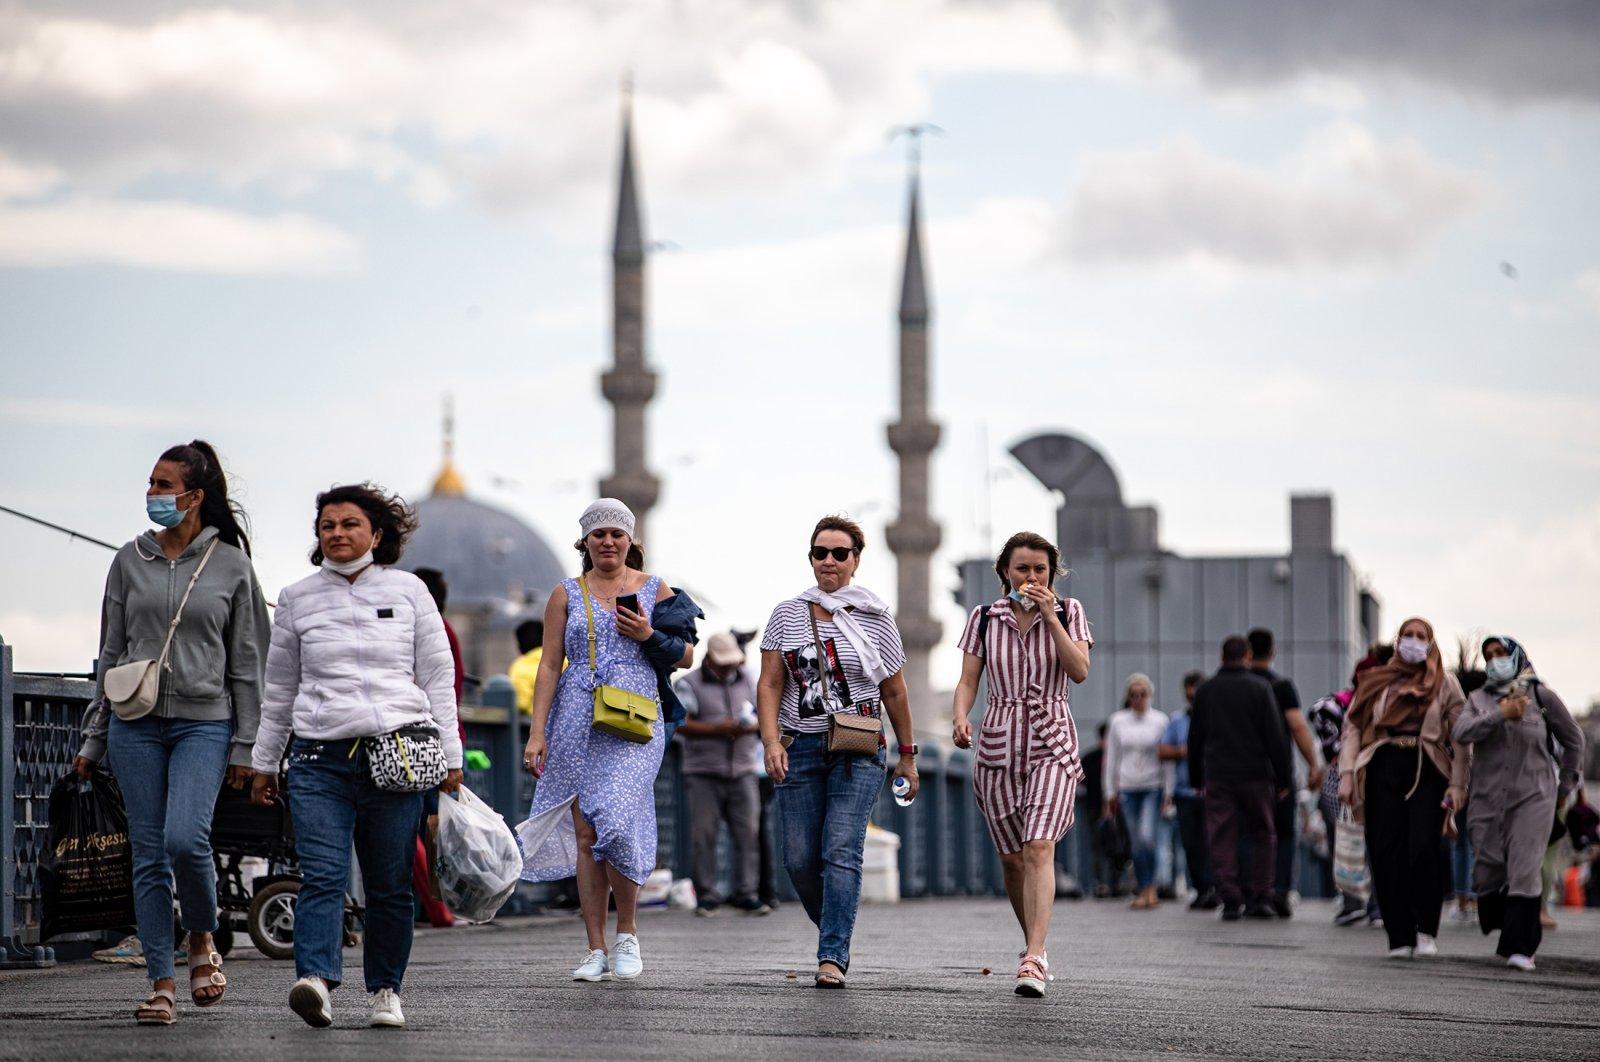 People wearing protective masks walk on the Galata Bridge, in Istanbul, Turkey, Sept. 6, 2021. (Reuters Photo)